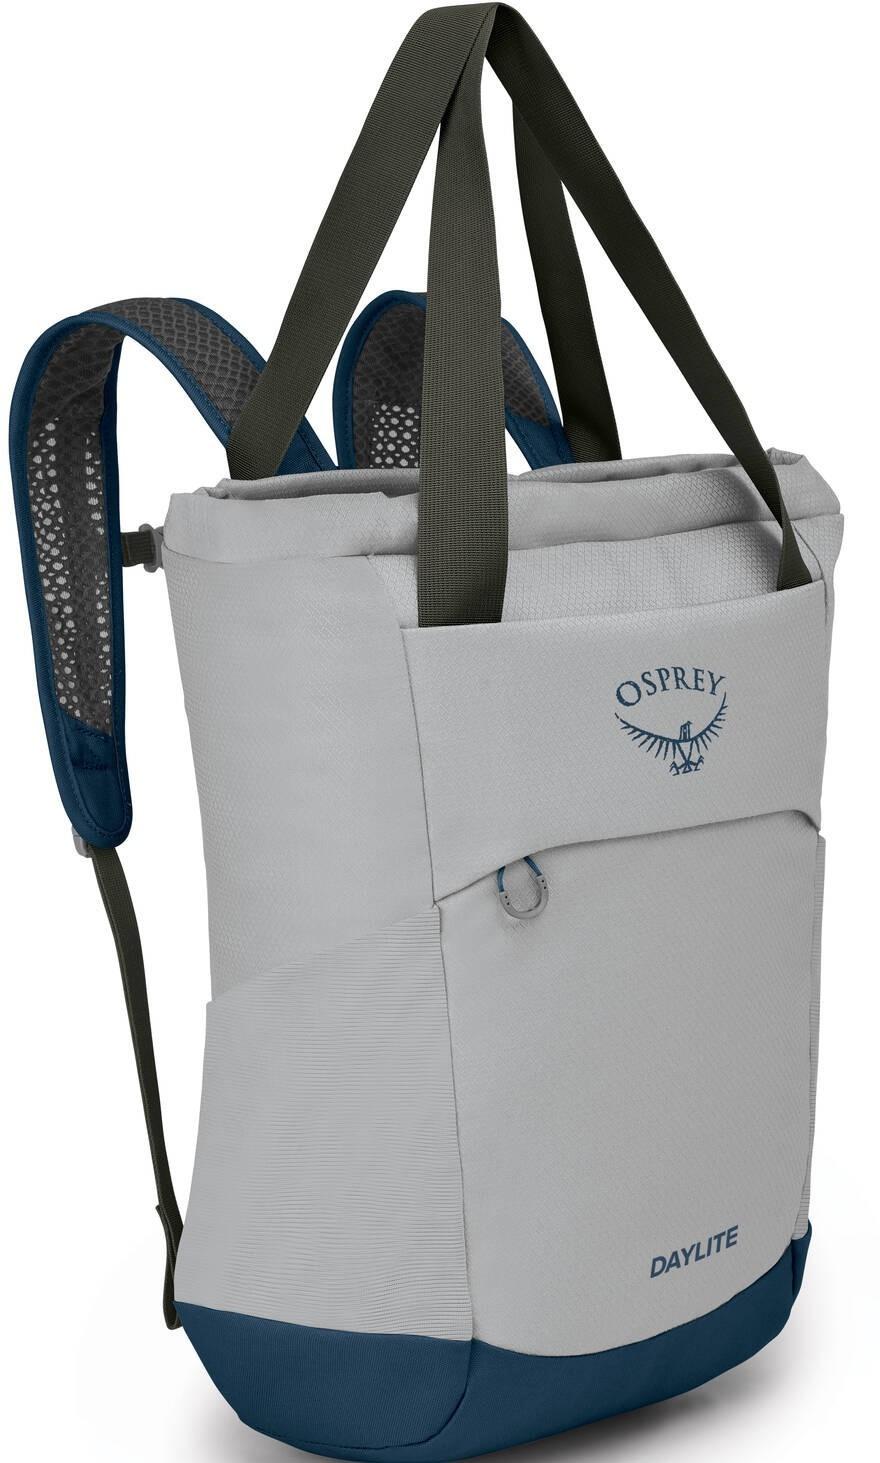 Городские рюкзаки Рюкзак Osprey Daylite Tote Pack 20, Aluminium Grey Daylite_Tote_Pack_S21_Side_Aluminum_Grey_web.jpg